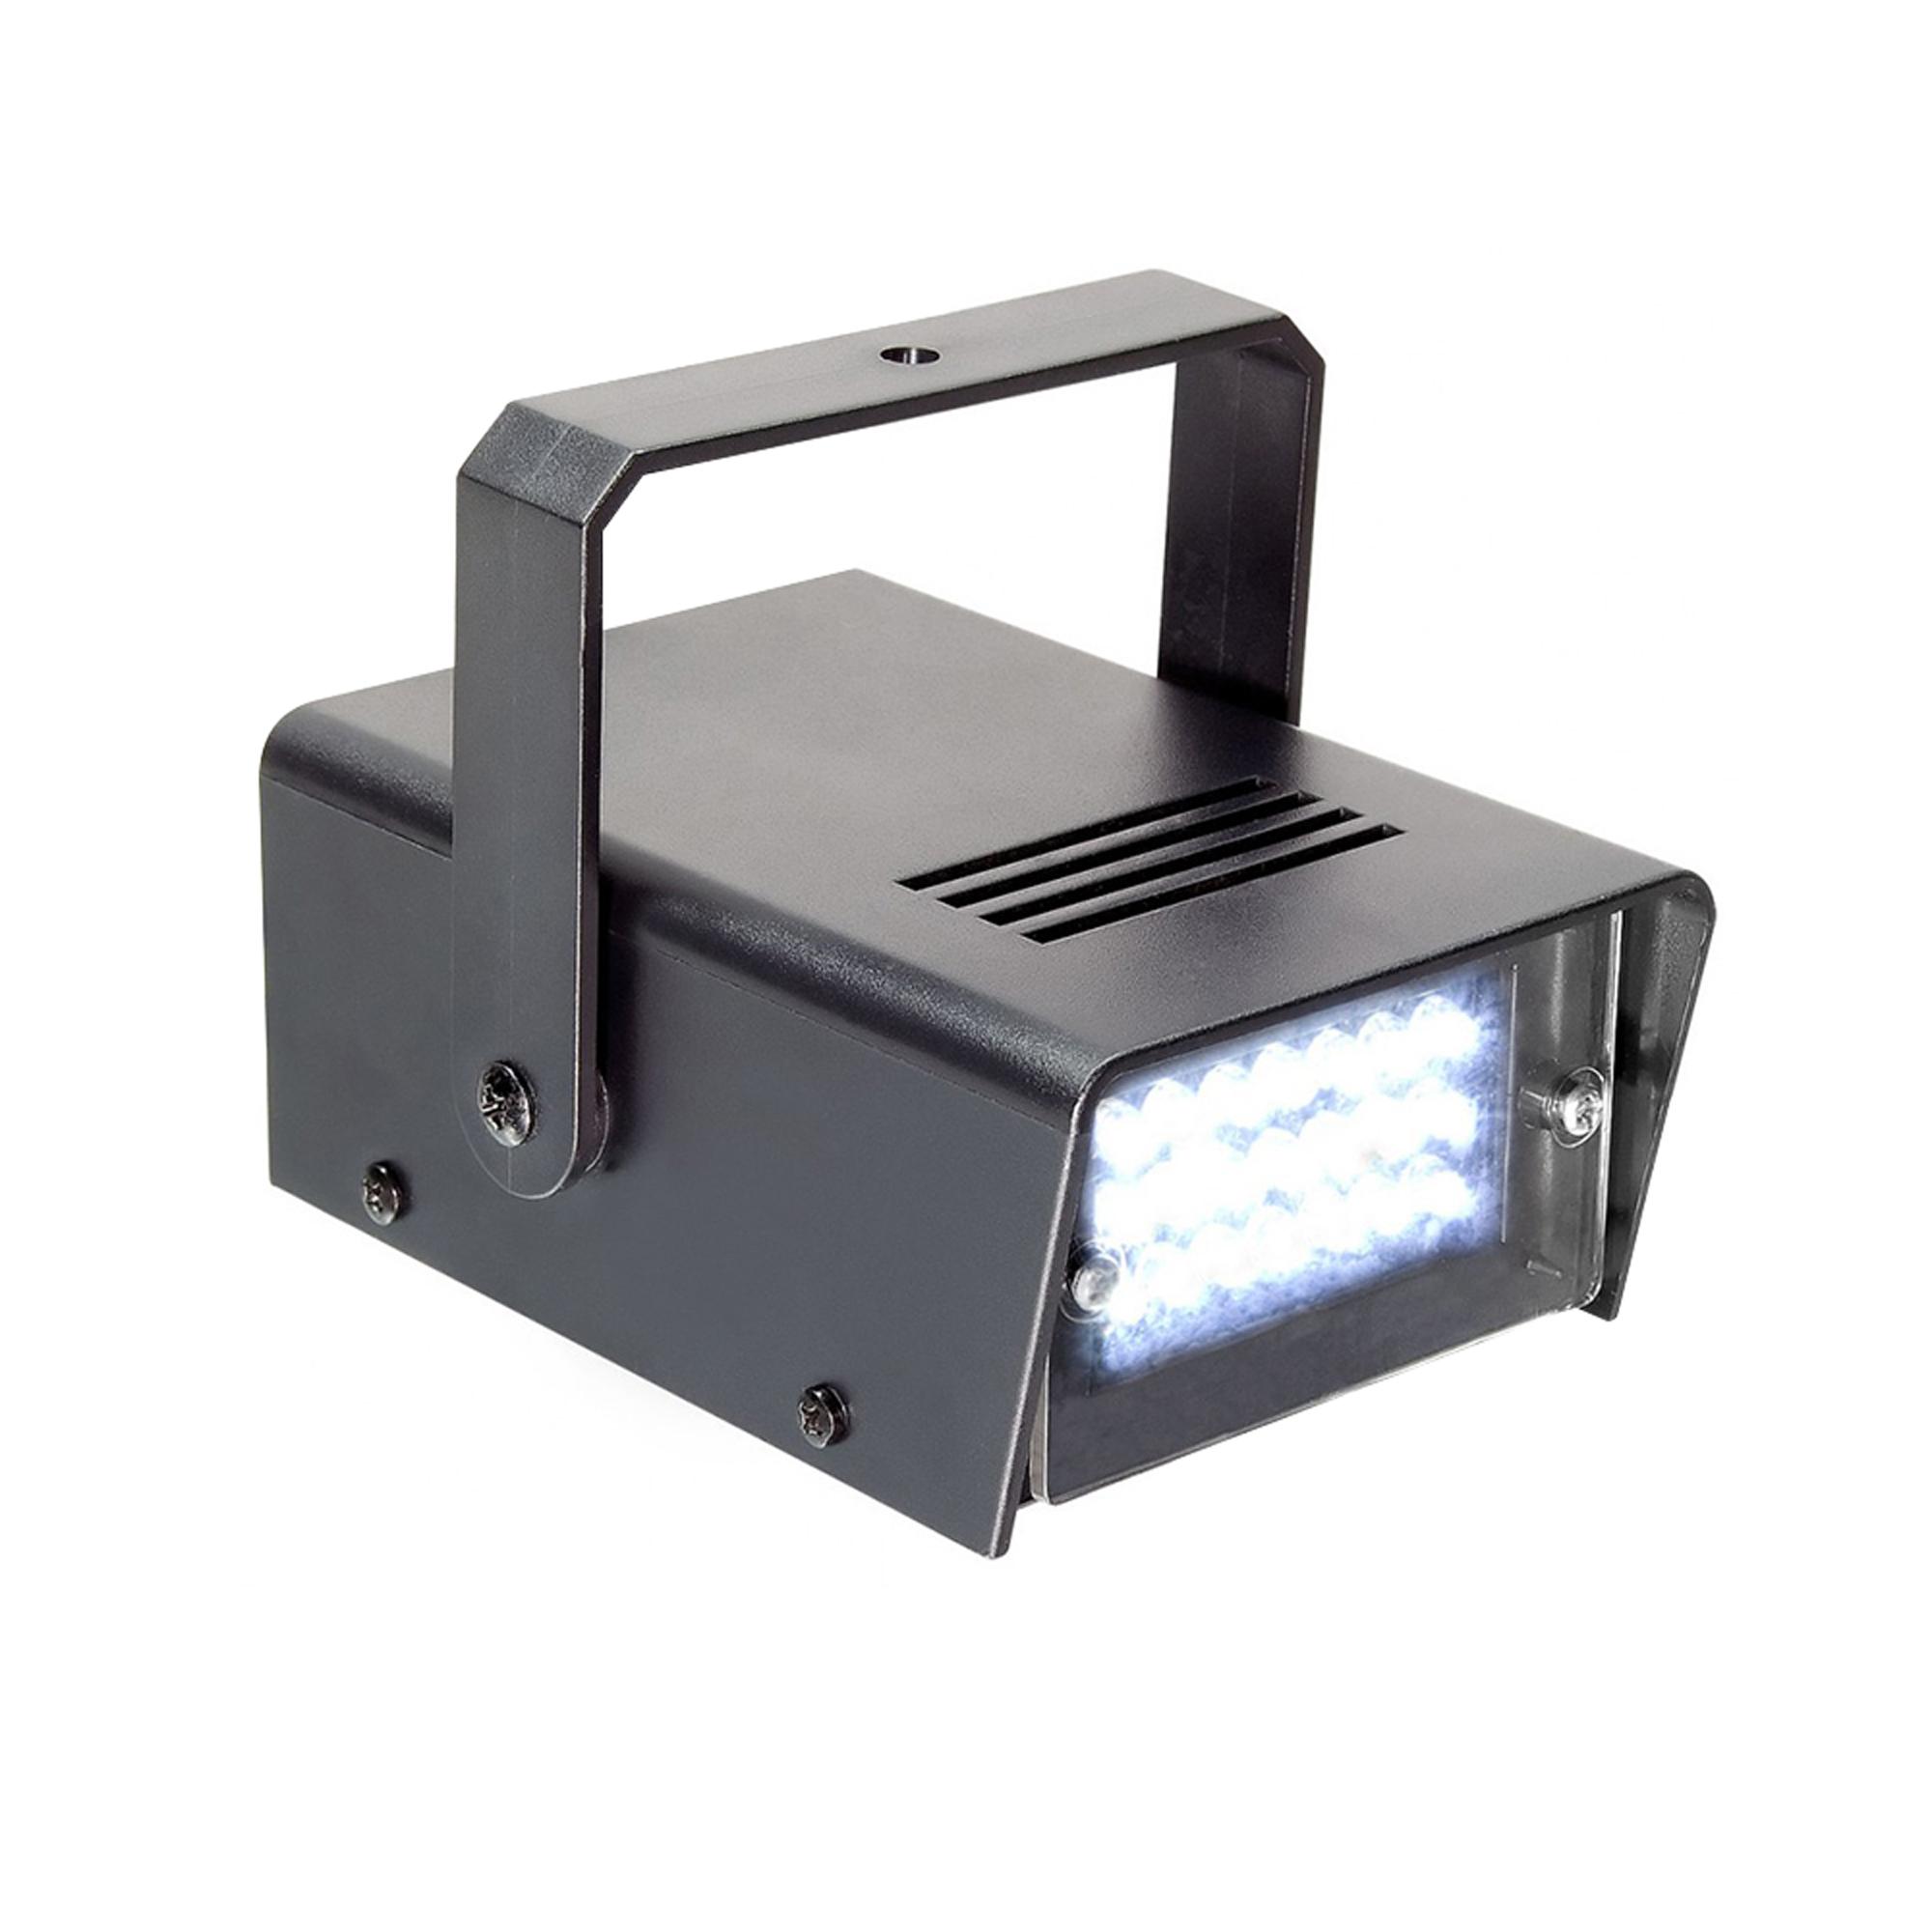 BeamZ Mini Stroboscope Strobe Light - Party Light